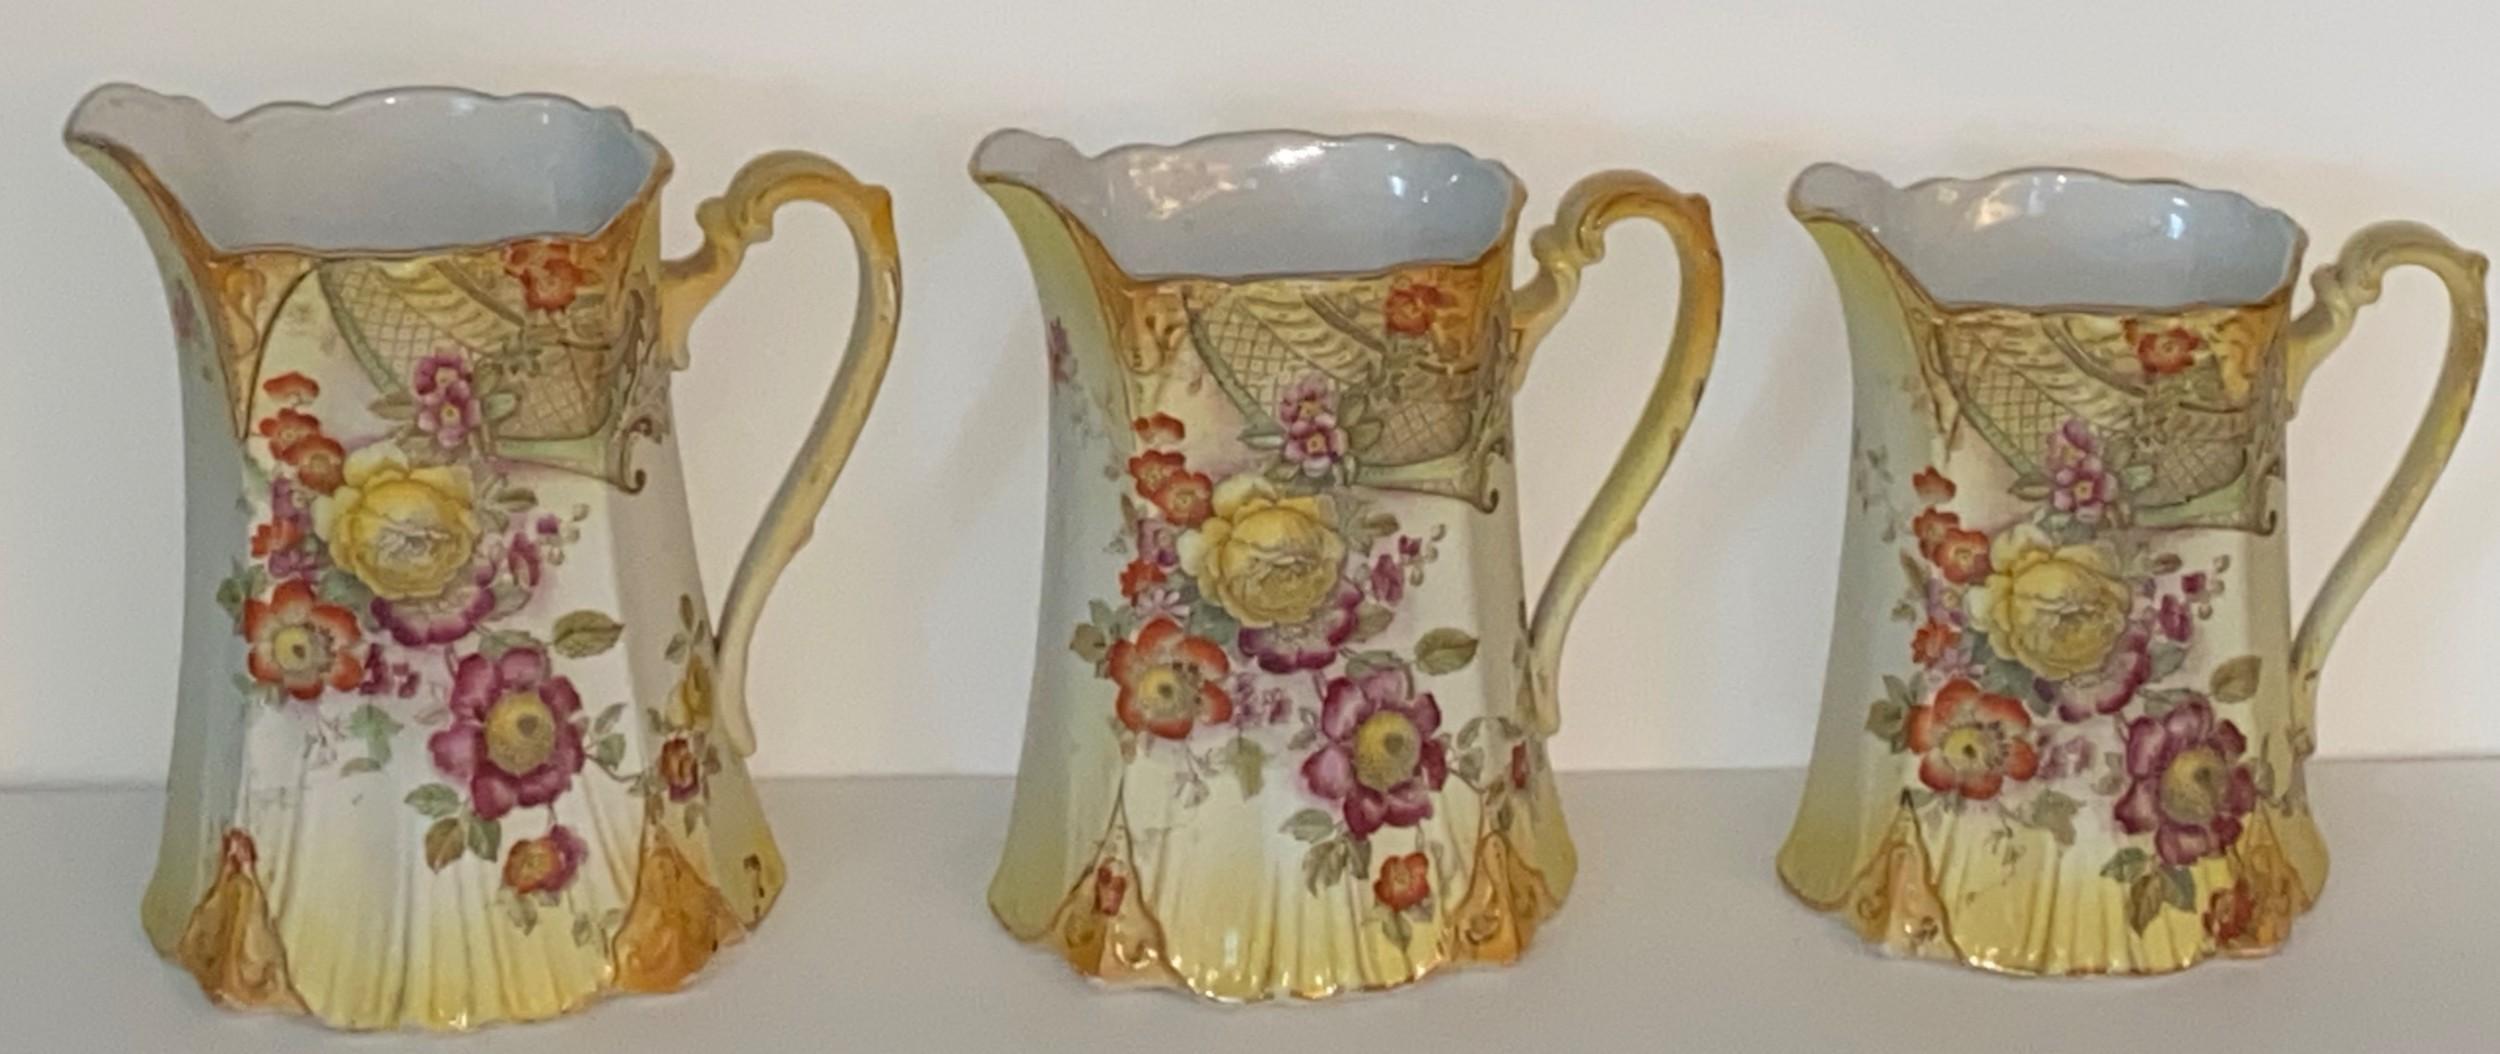 three graduated antique jugs